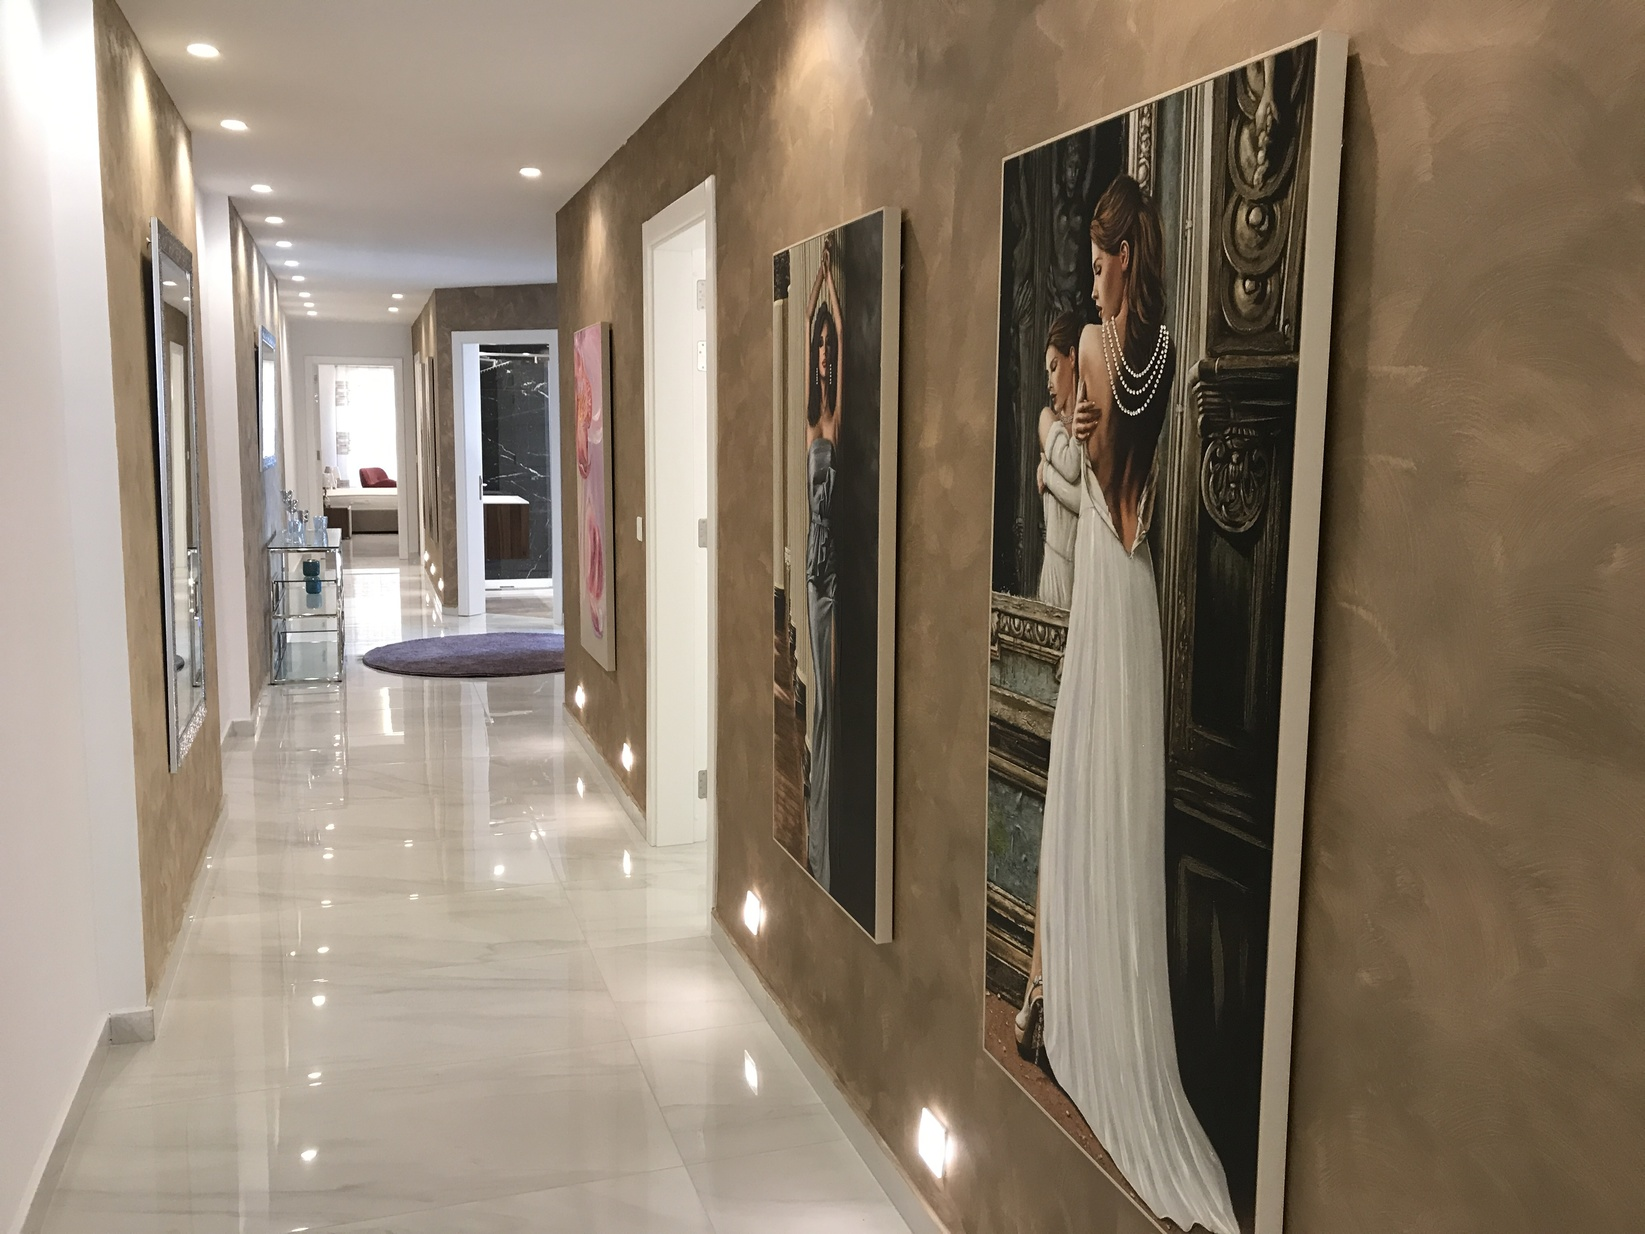 3 bed Apartment For Rent in Qawra, Qawra - thumb 25